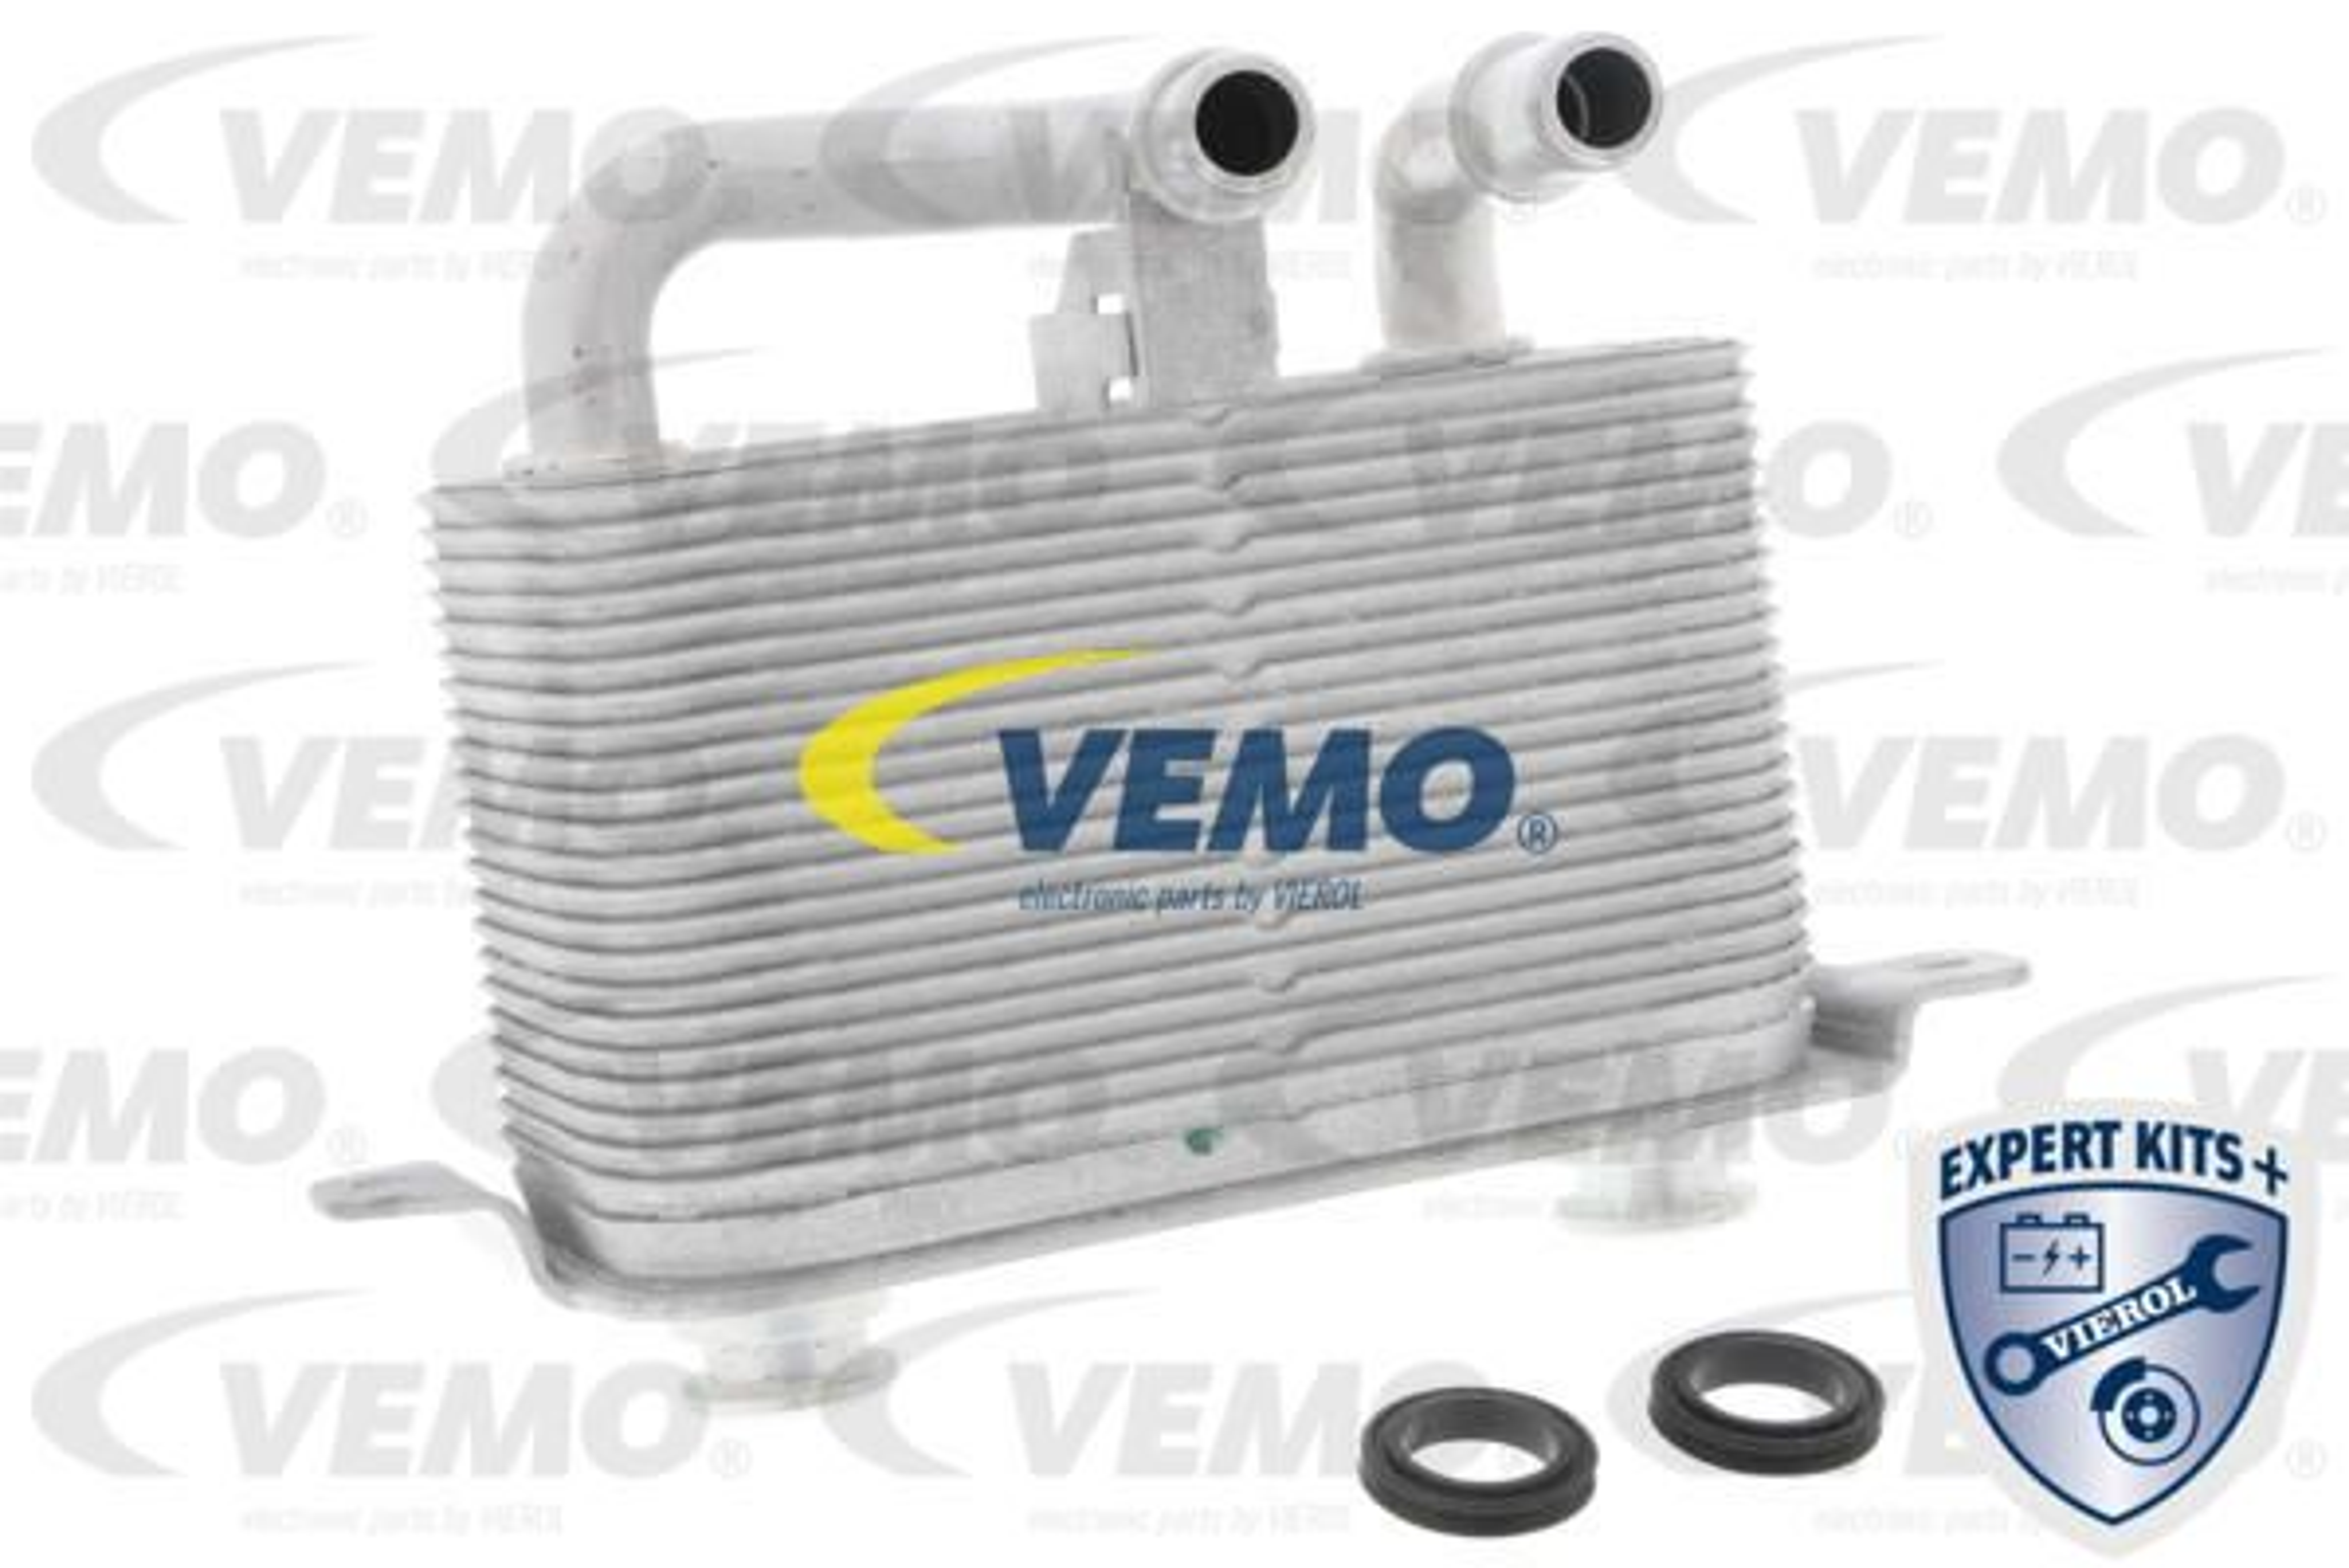 V20-60-0032 VEMO Ölkühler, Automatikgetriebe V20-60-0032 günstig kaufen